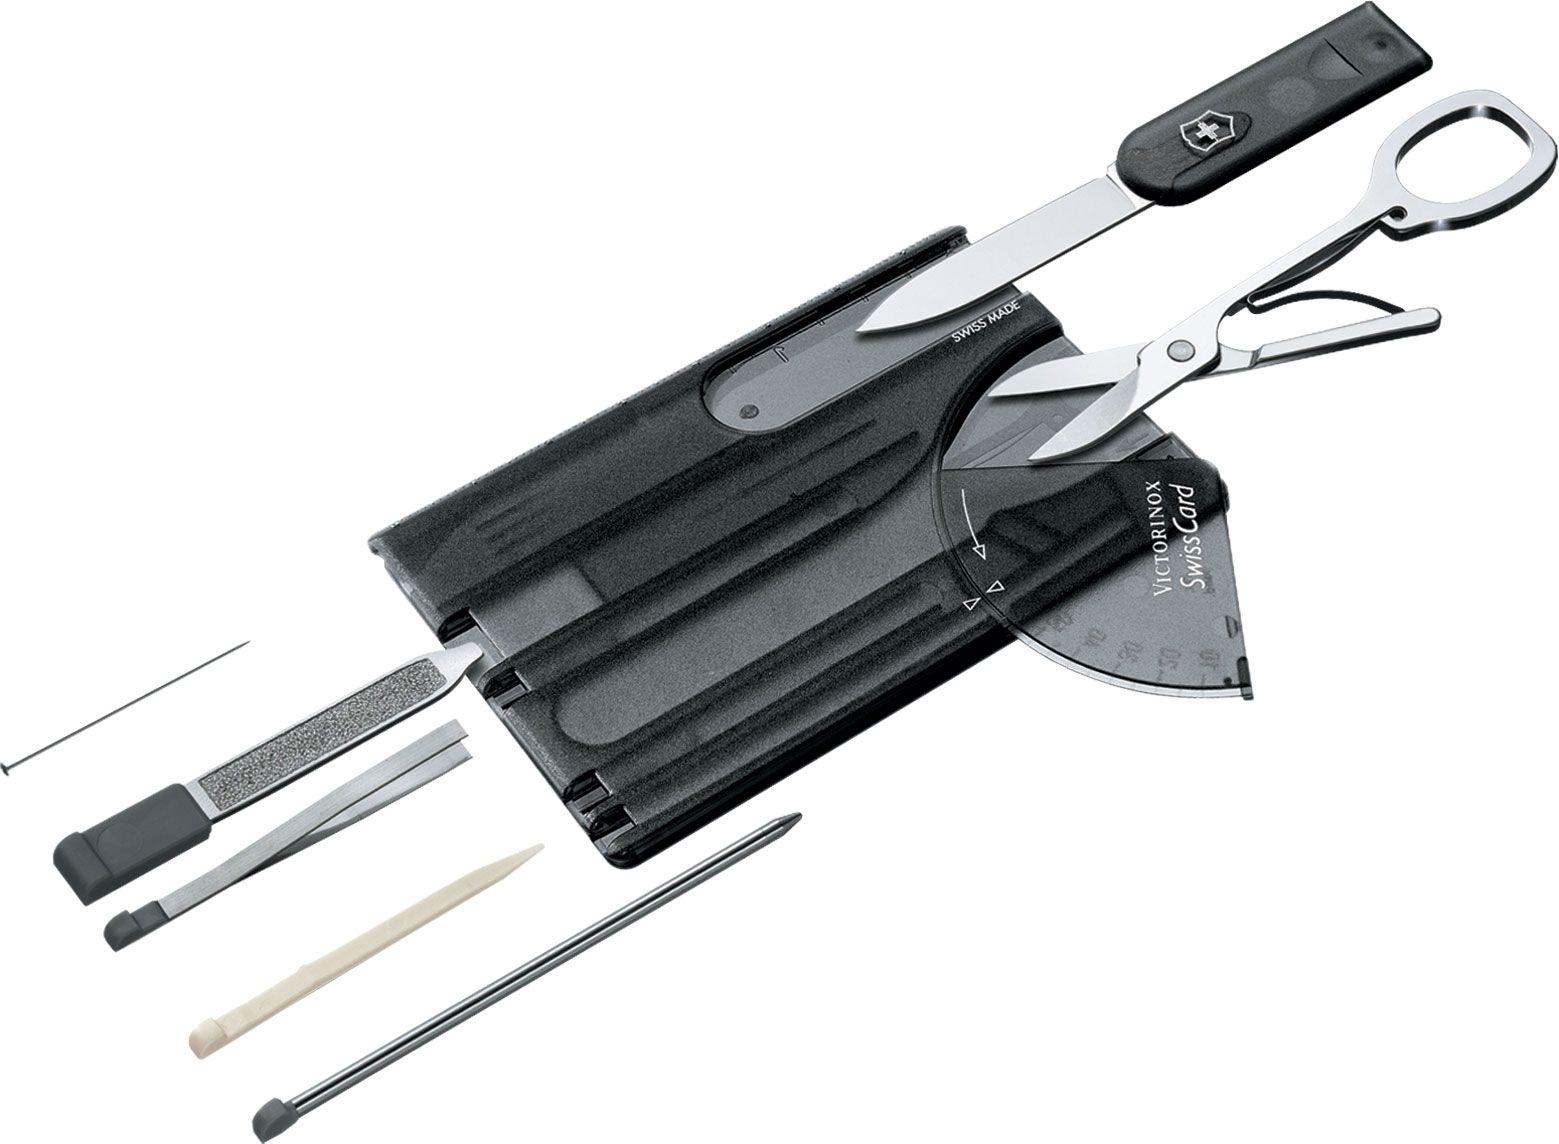 Victorinox Swiss Army SwissCard Multi-Tool, Translucent Onyx (Old Sku 53937)